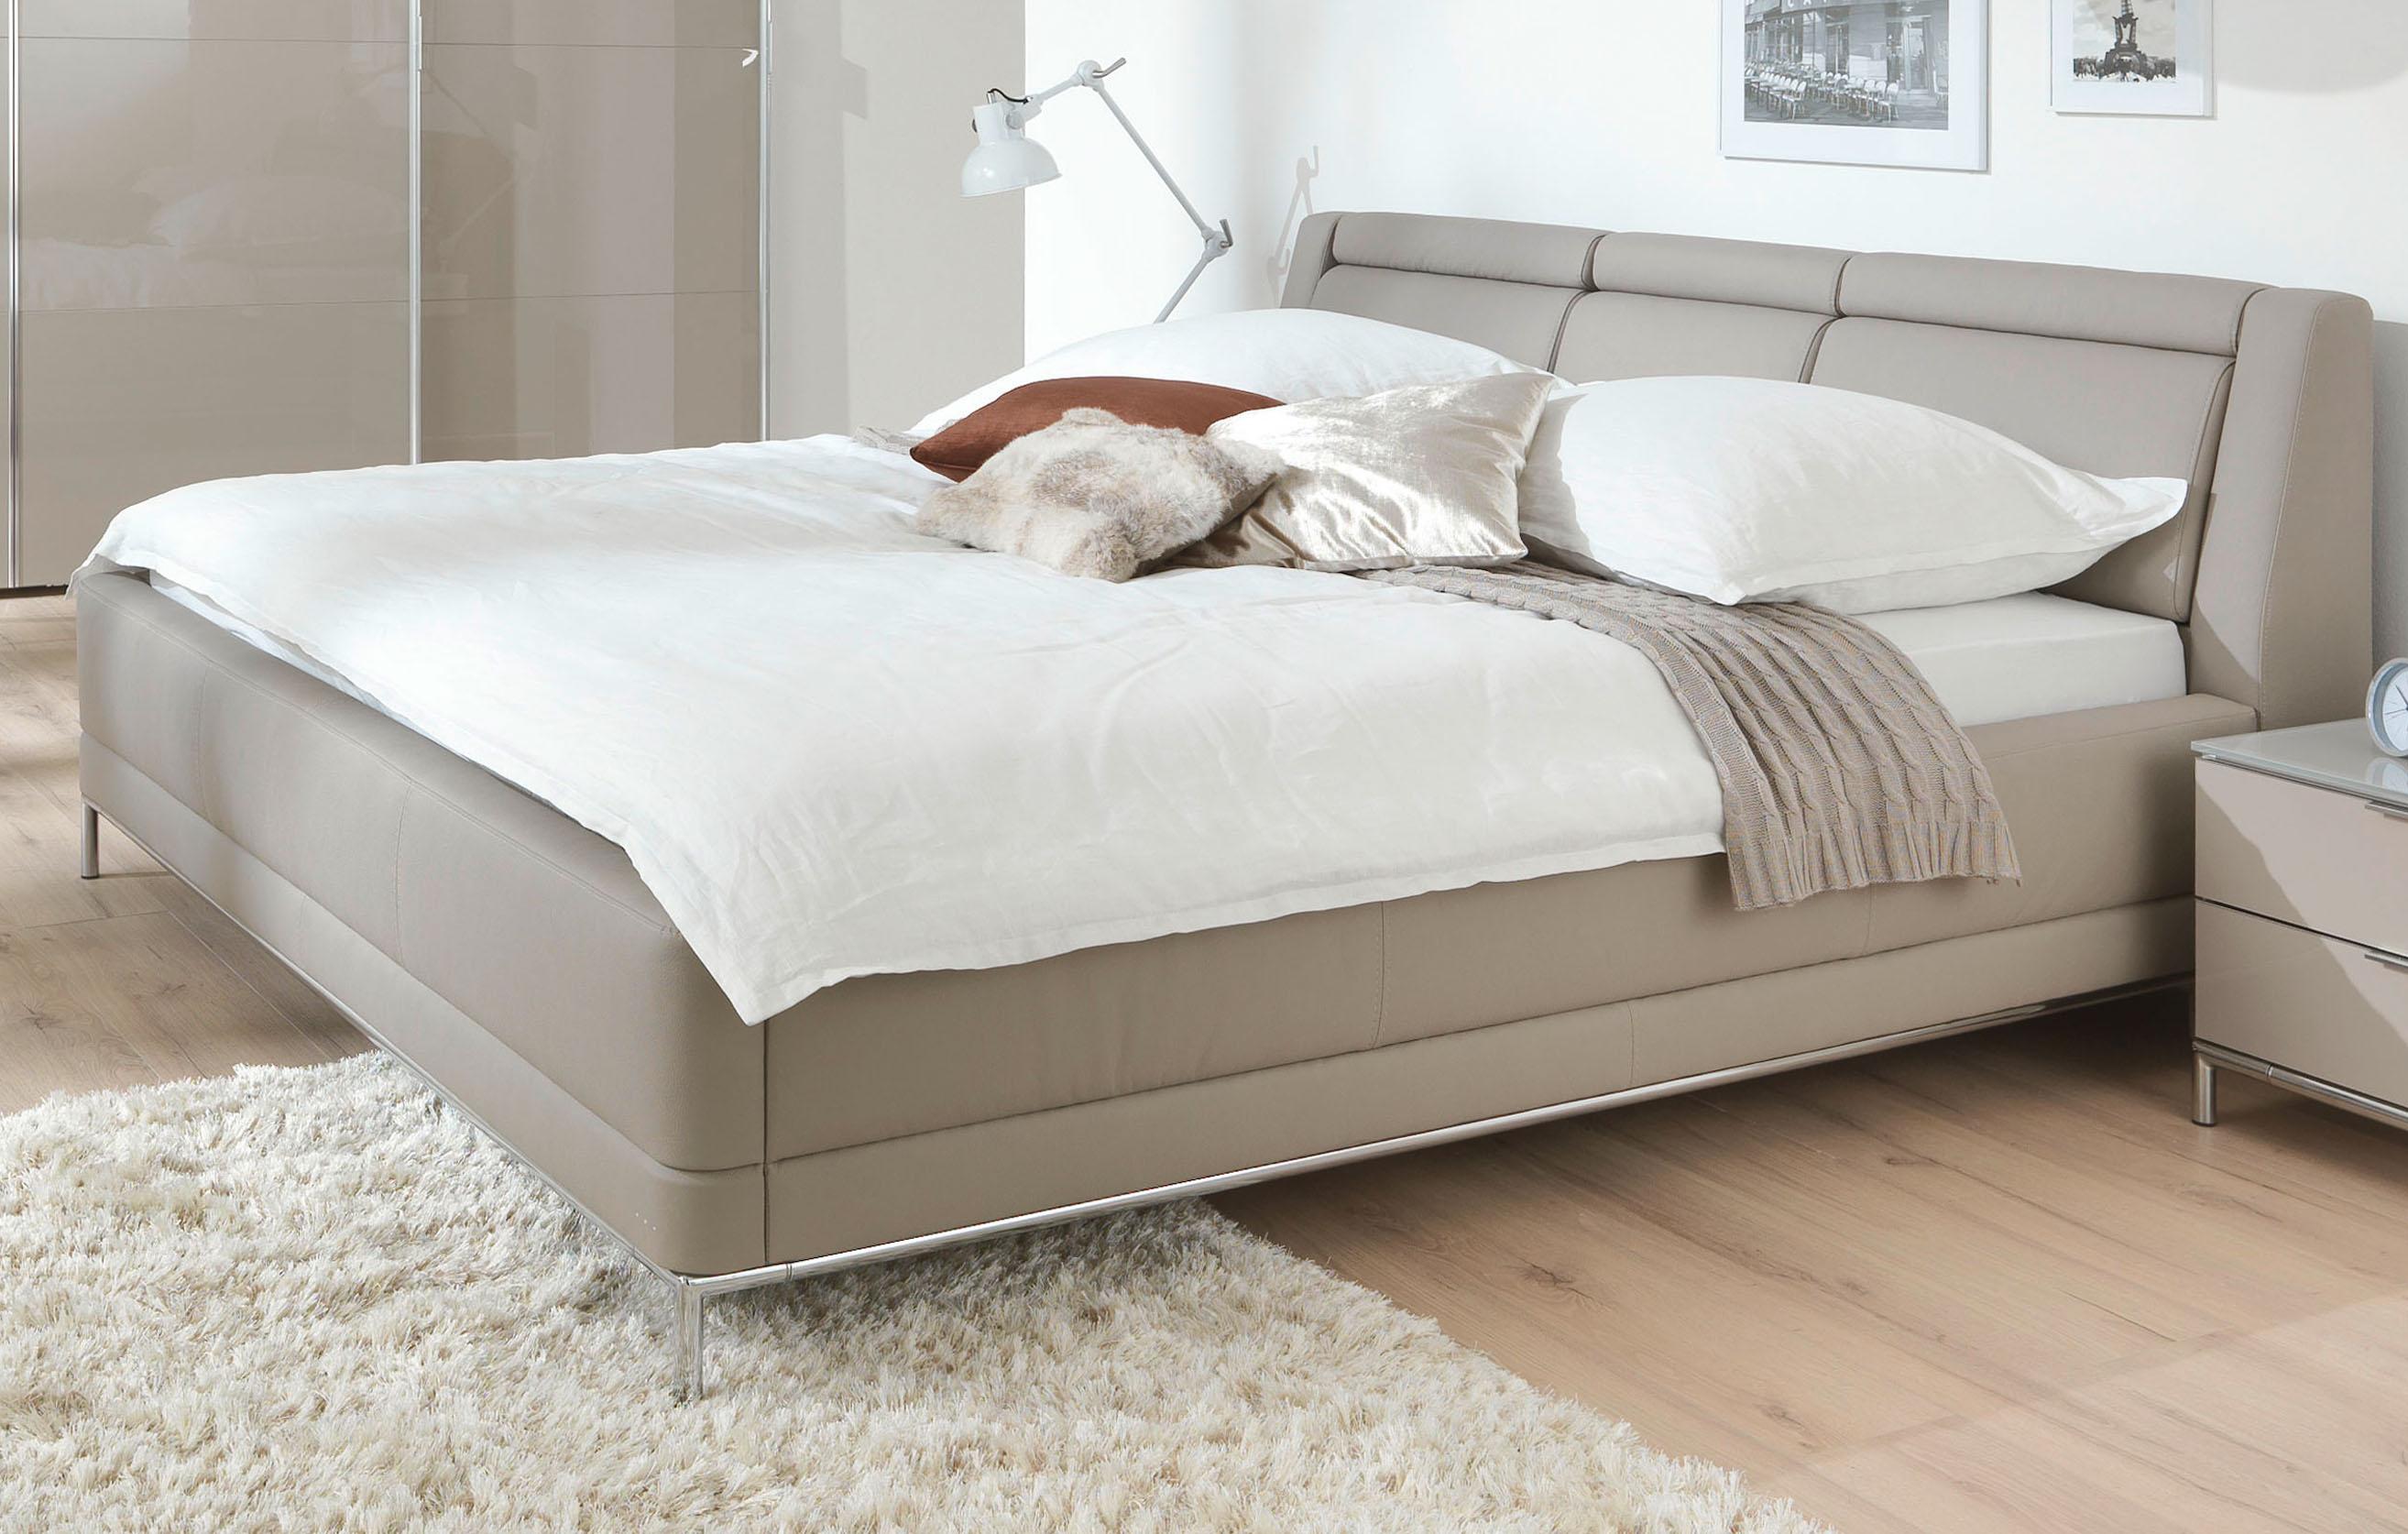 bett sandgrau interessante ideen f r die. Black Bedroom Furniture Sets. Home Design Ideas